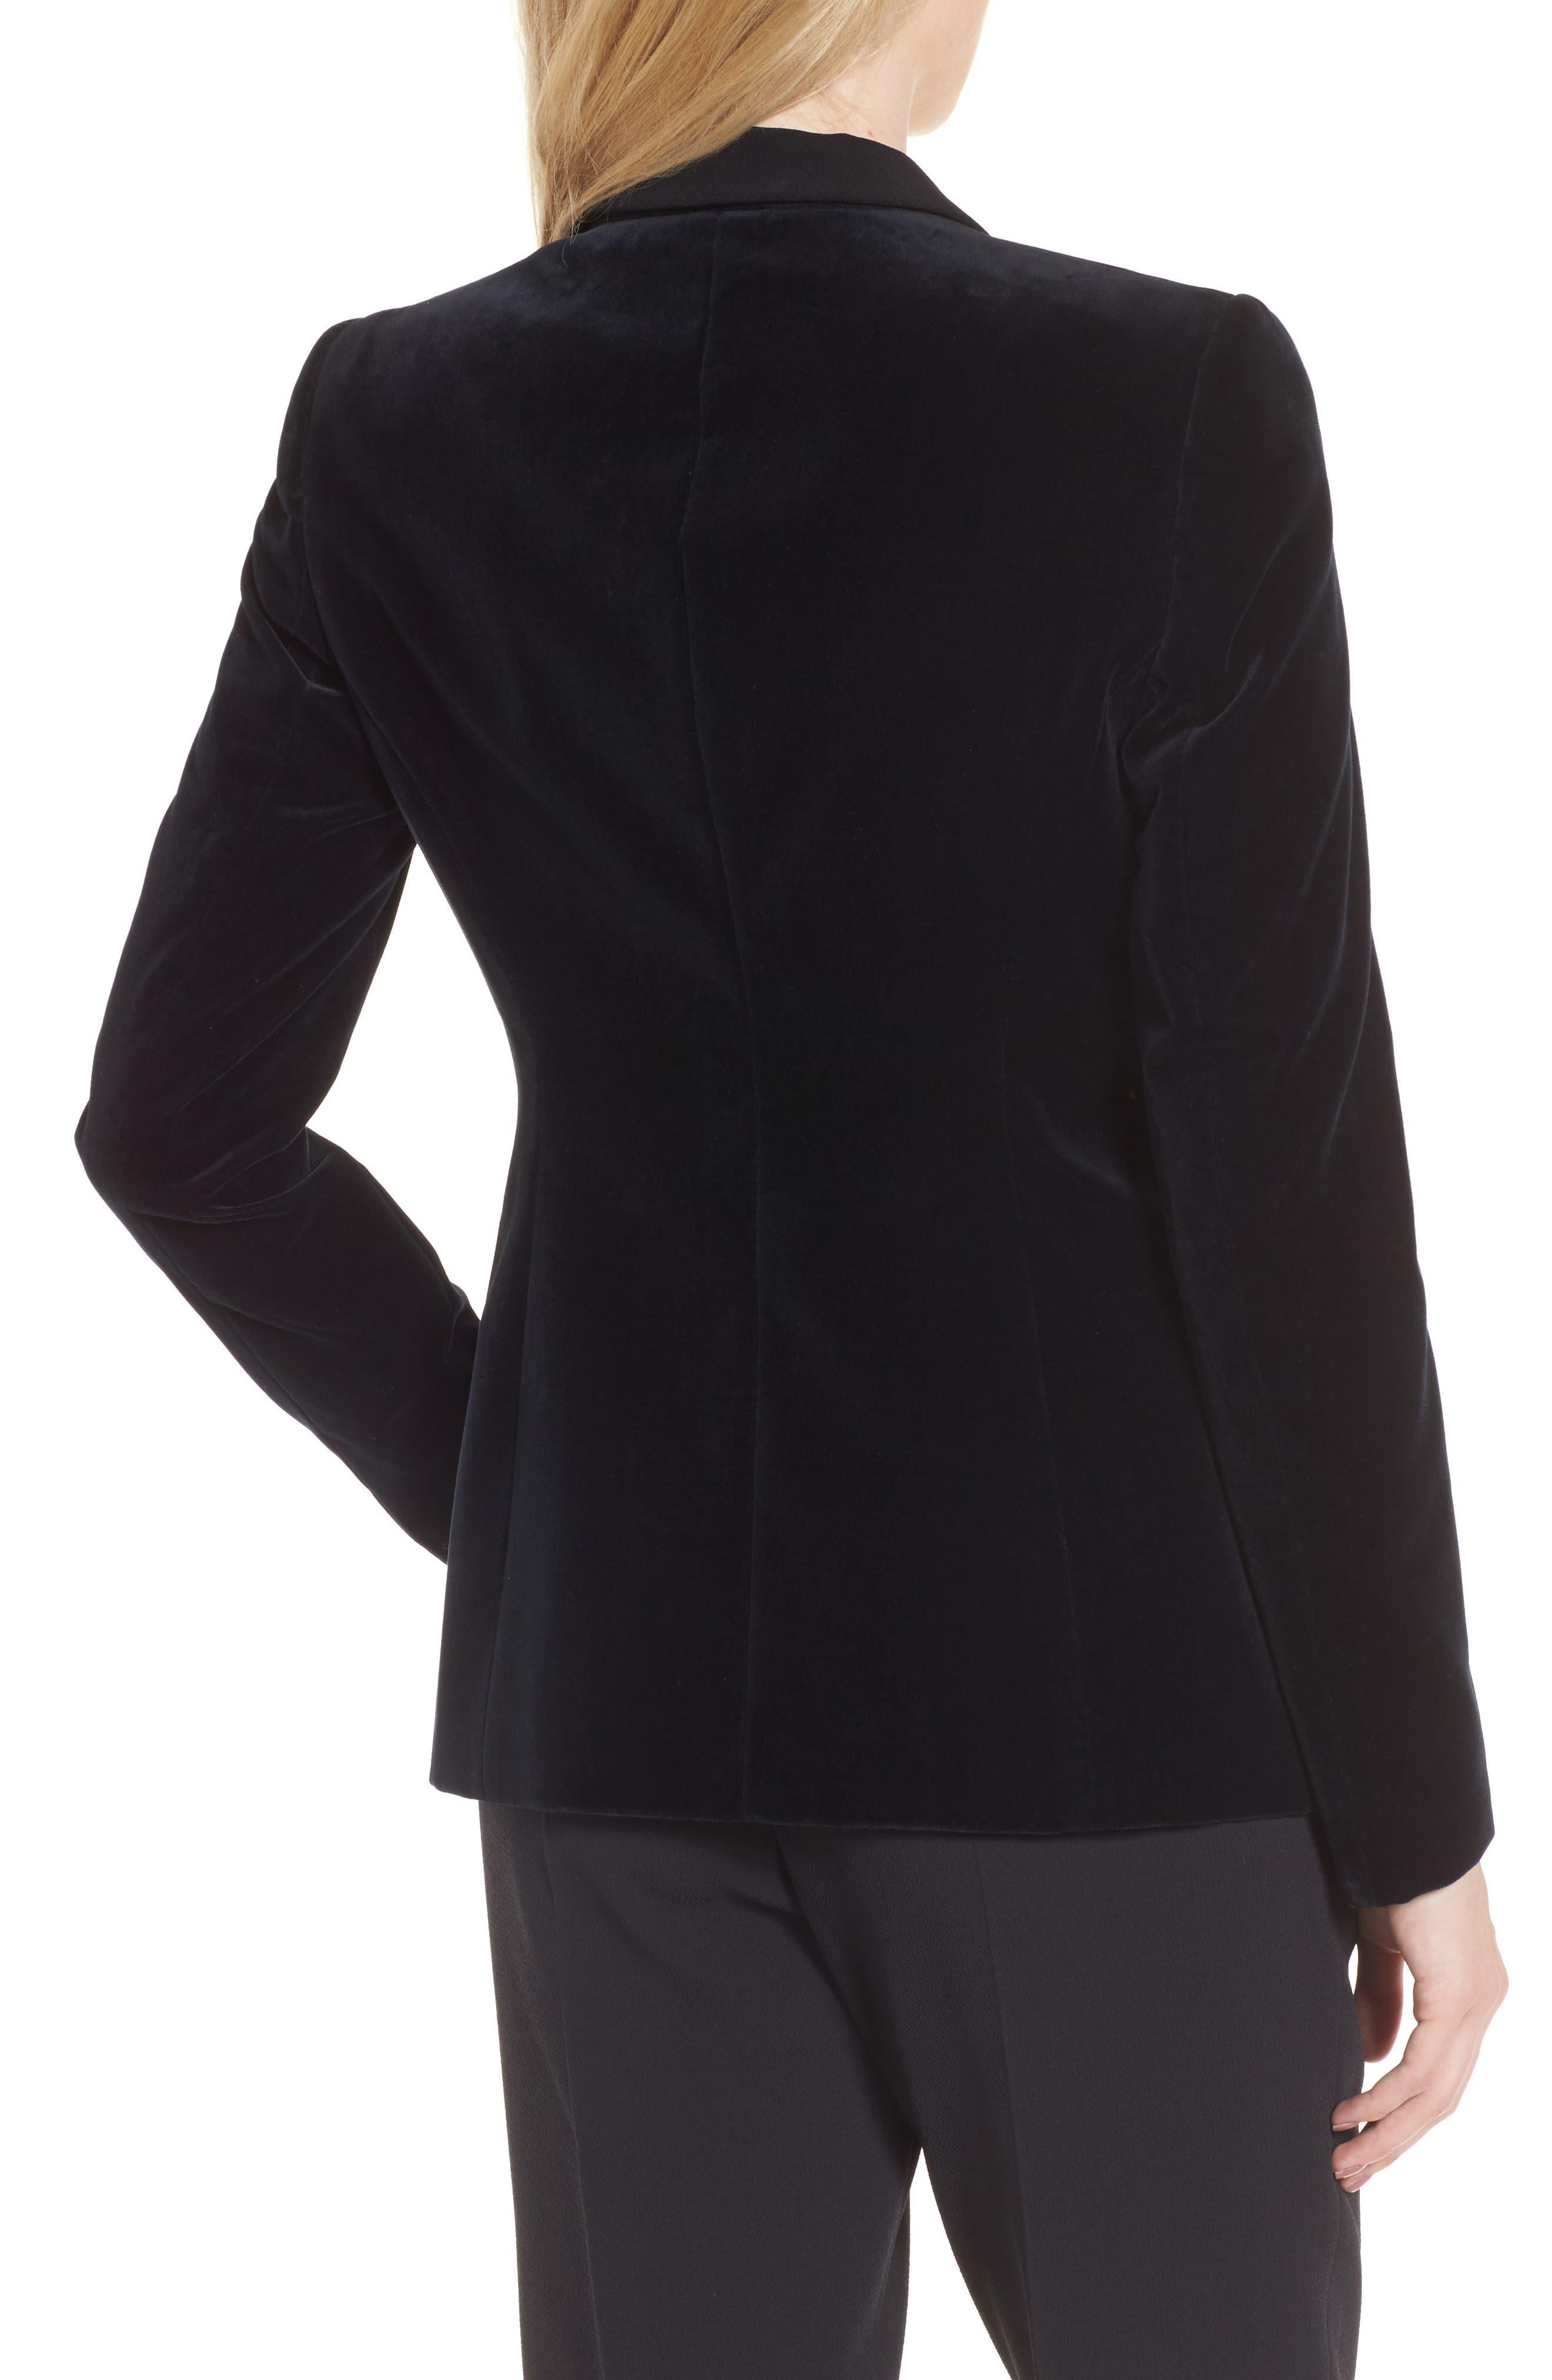 Jeronala Velvet Tuxedo Jacket,                             Alternate thumbnail 2, color,                             480